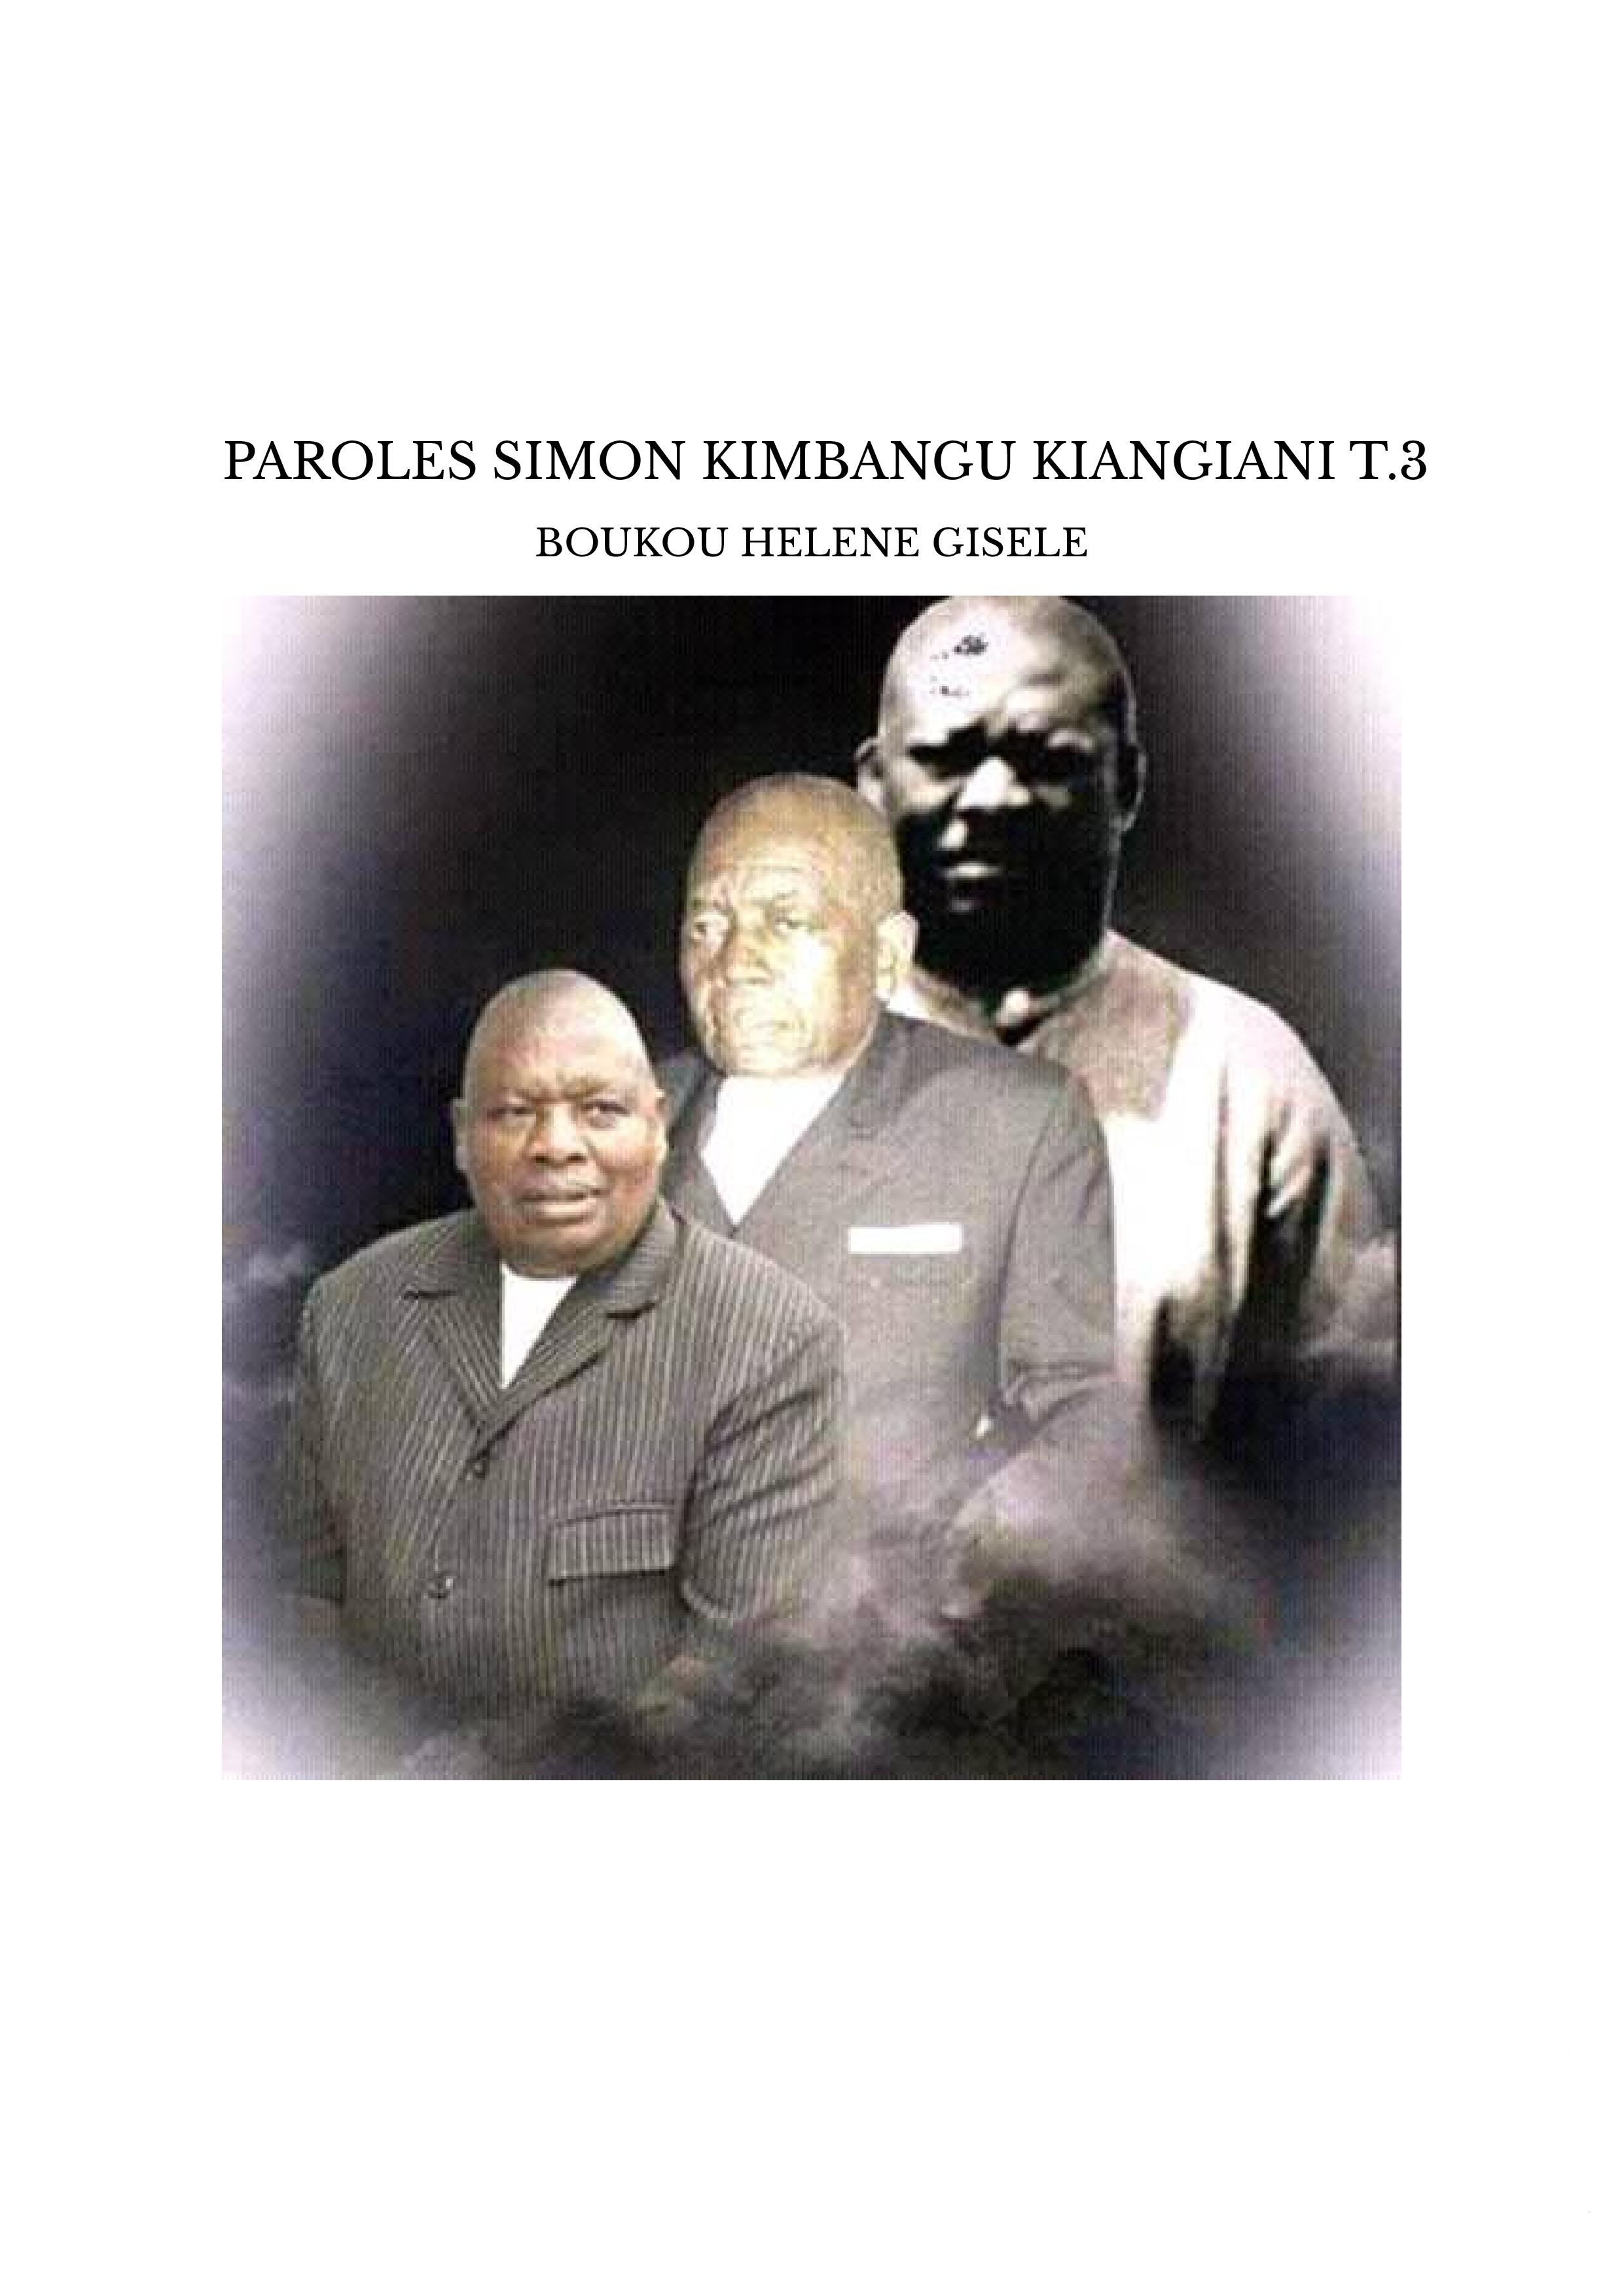 PAROLES SIMON KIMBANGU KIANGIANI T.3